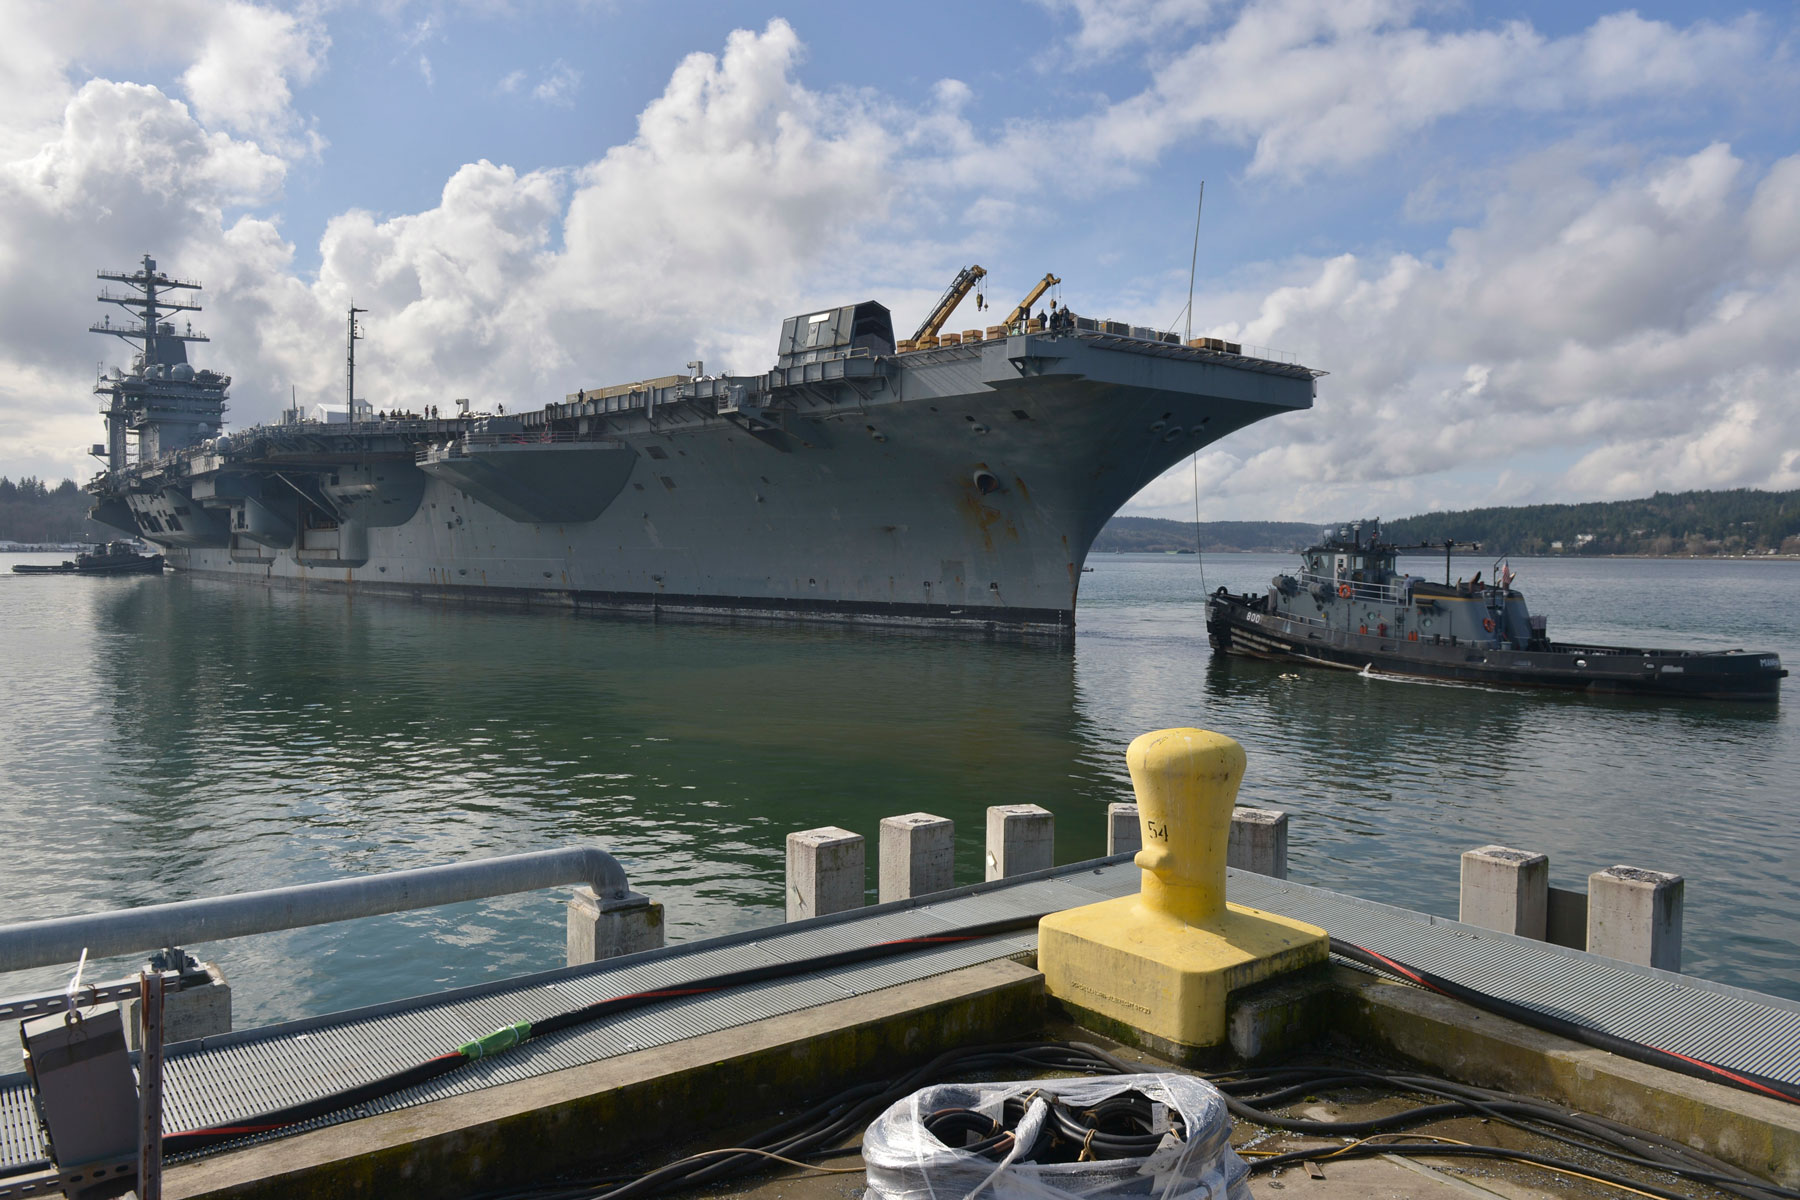 Navy Dumps Hazardous Substances into Puget Sound: Washington State AG